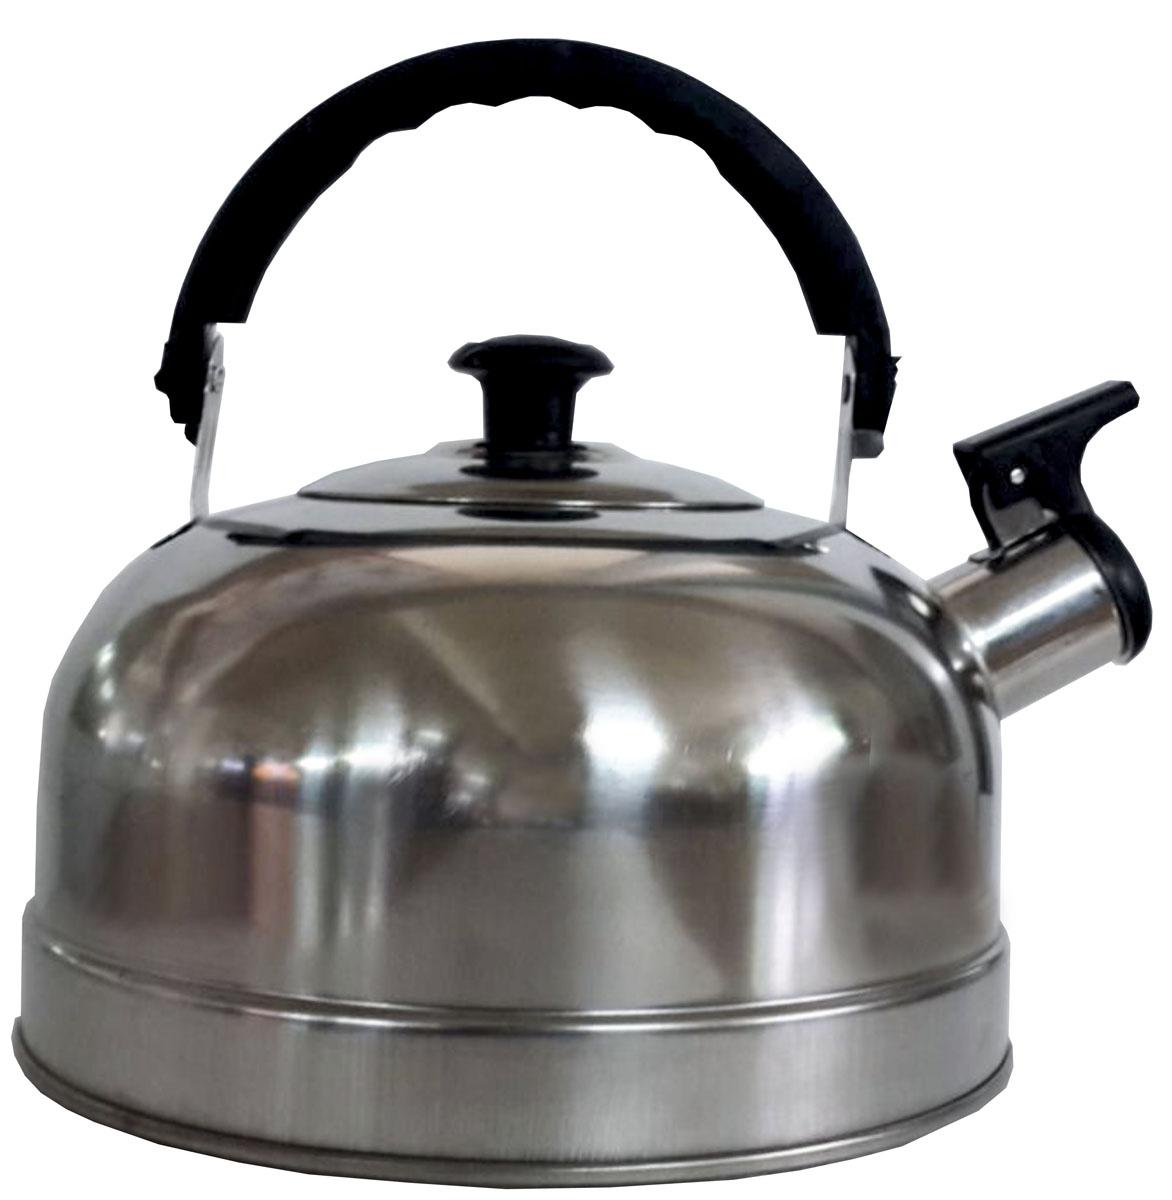 Чайник Irit, со свистком, цвет: серебристый, 1,7 л чайник lumme со свистком цвет золотистый 1 8 л